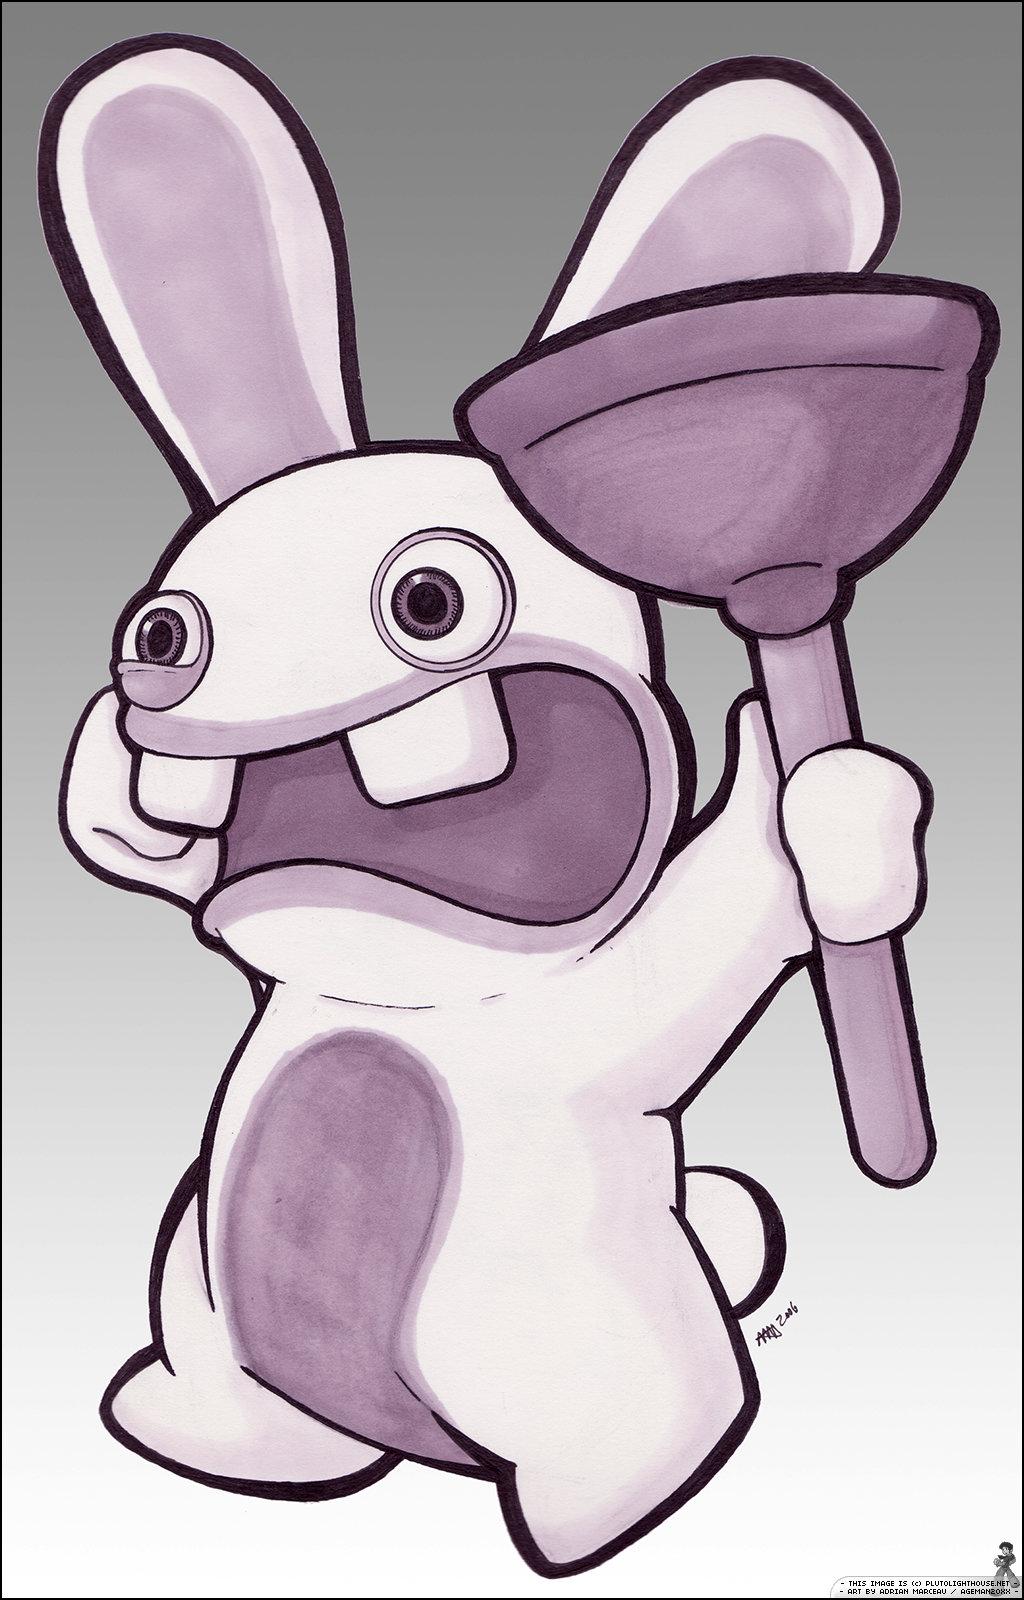 Drawn rabbid bunny tail By Rayman Ageman20XX by Rabbids